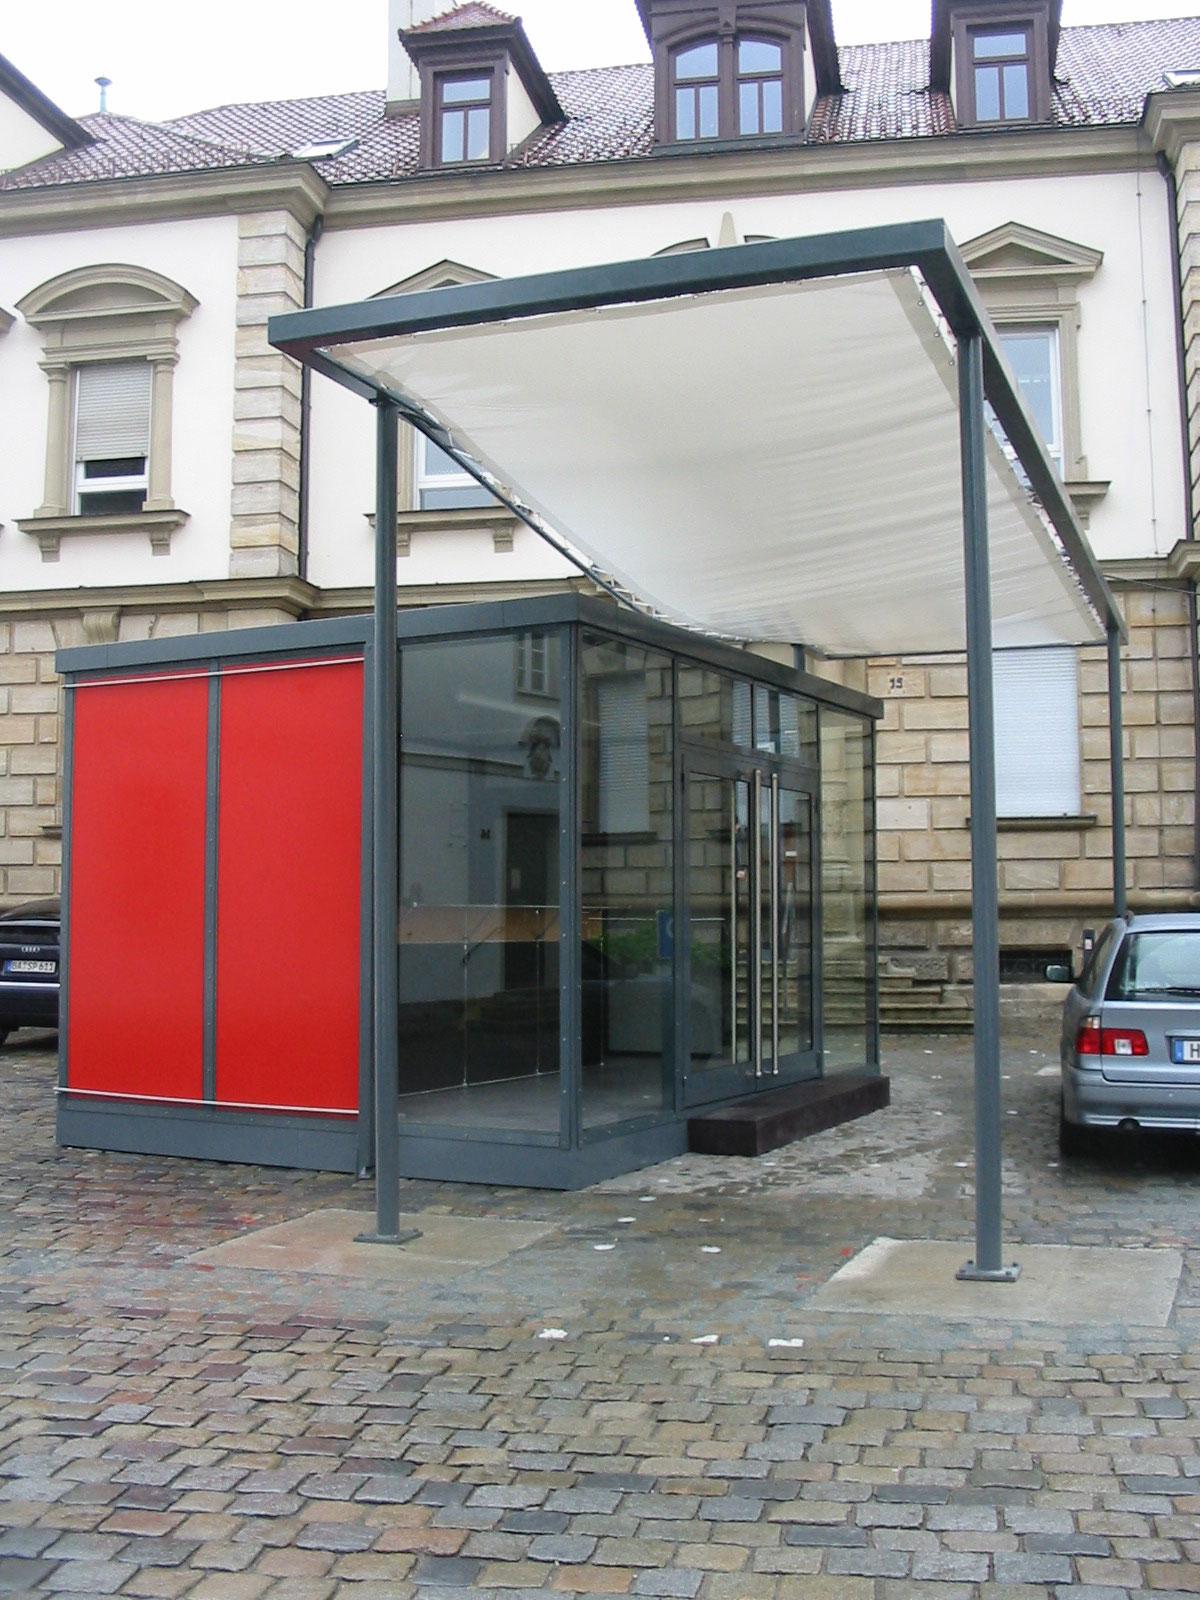 Info-Pavillon Bayerische Landesausstellung 2004, Forchheim